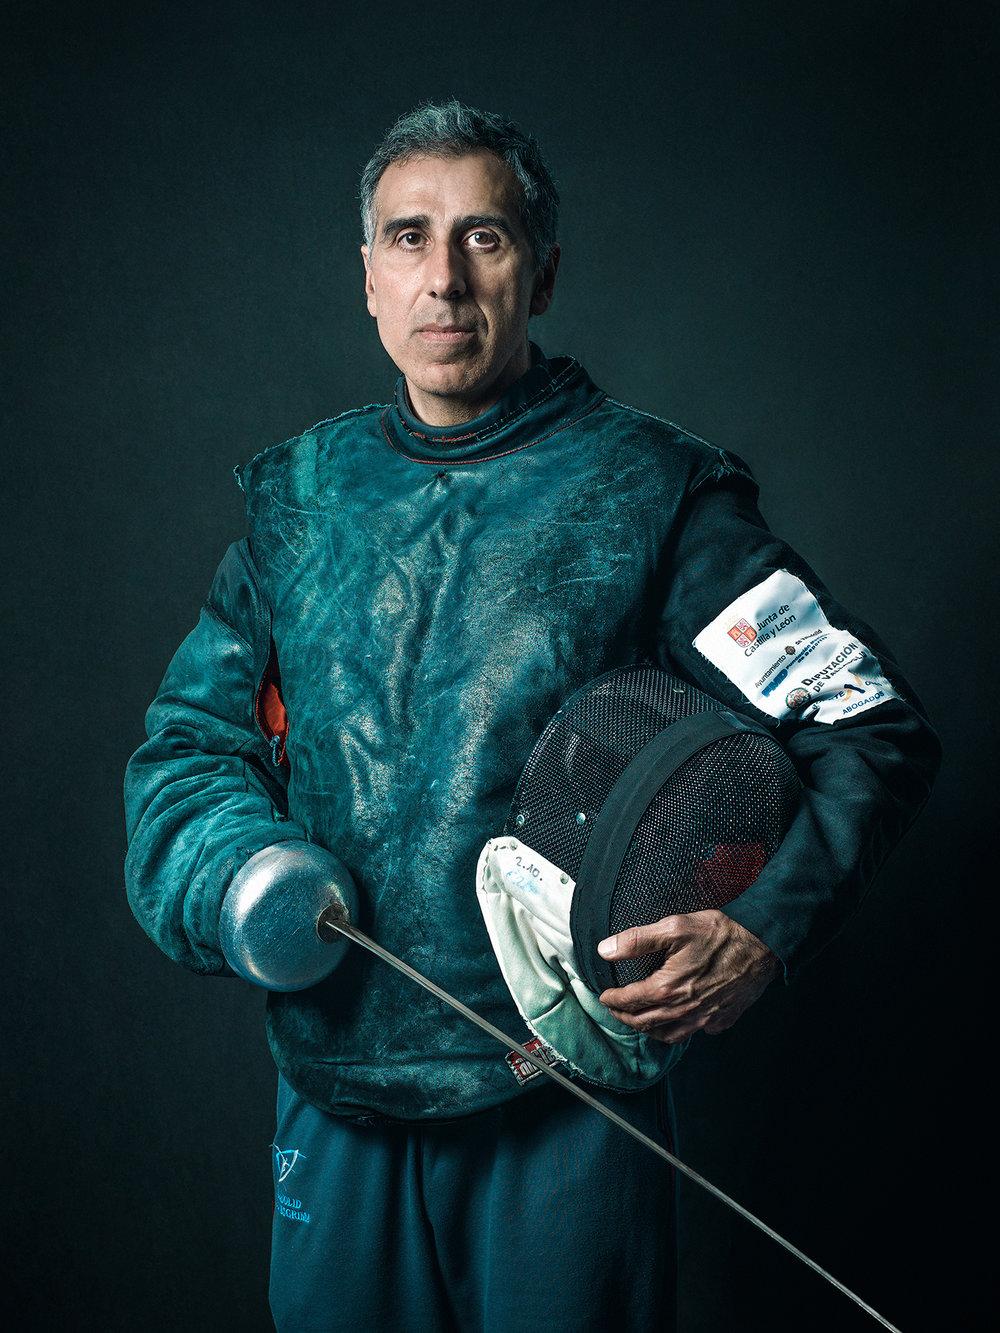 Oscar-arribas-esgrima-maestro-fencing-master-fencer-fechten-scherma-escrime-portrait-fotografo-retrato-photographer009.jpg